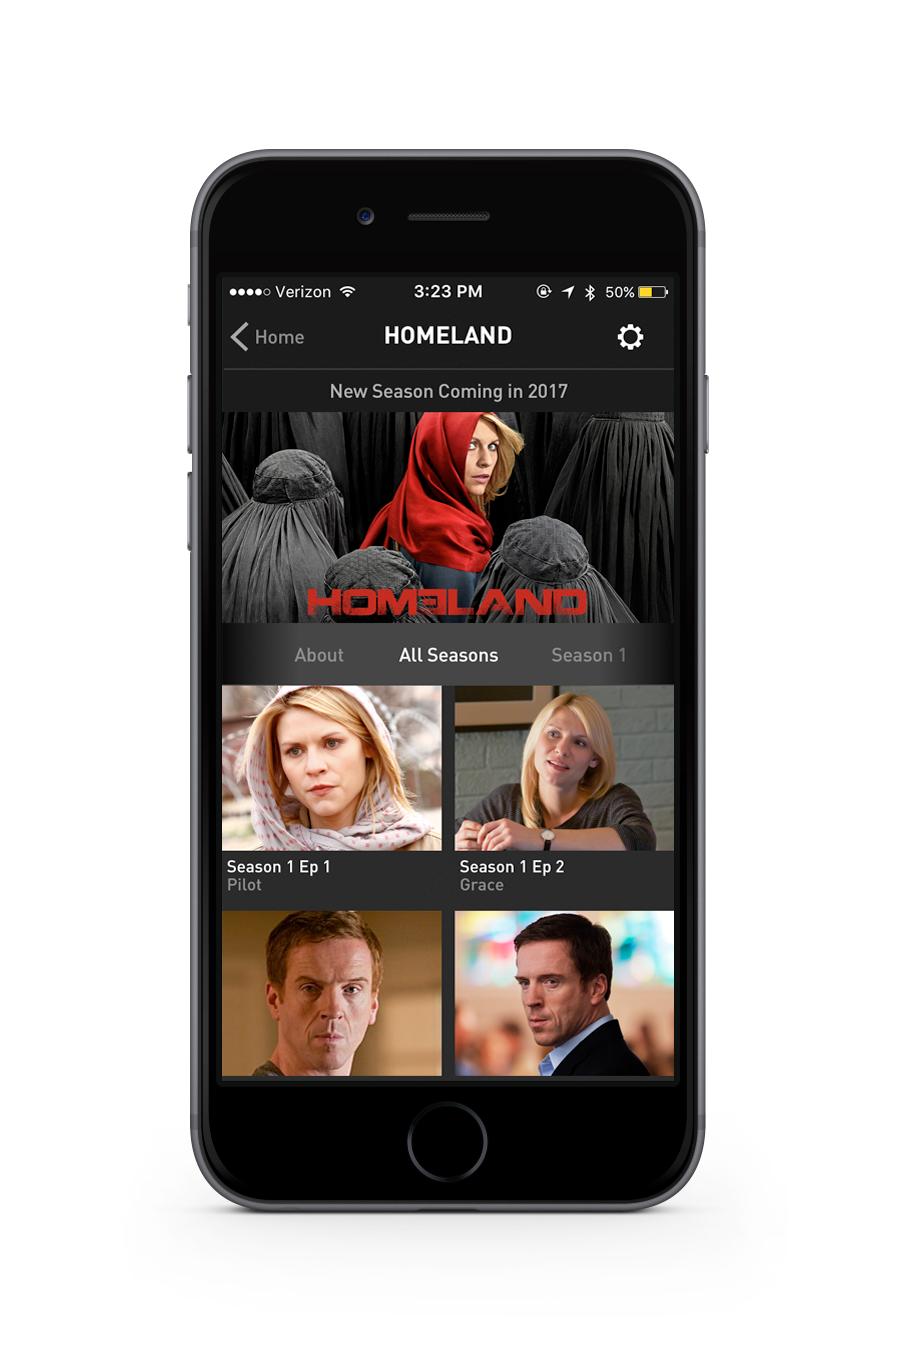 showtime-app-covershot-2.png